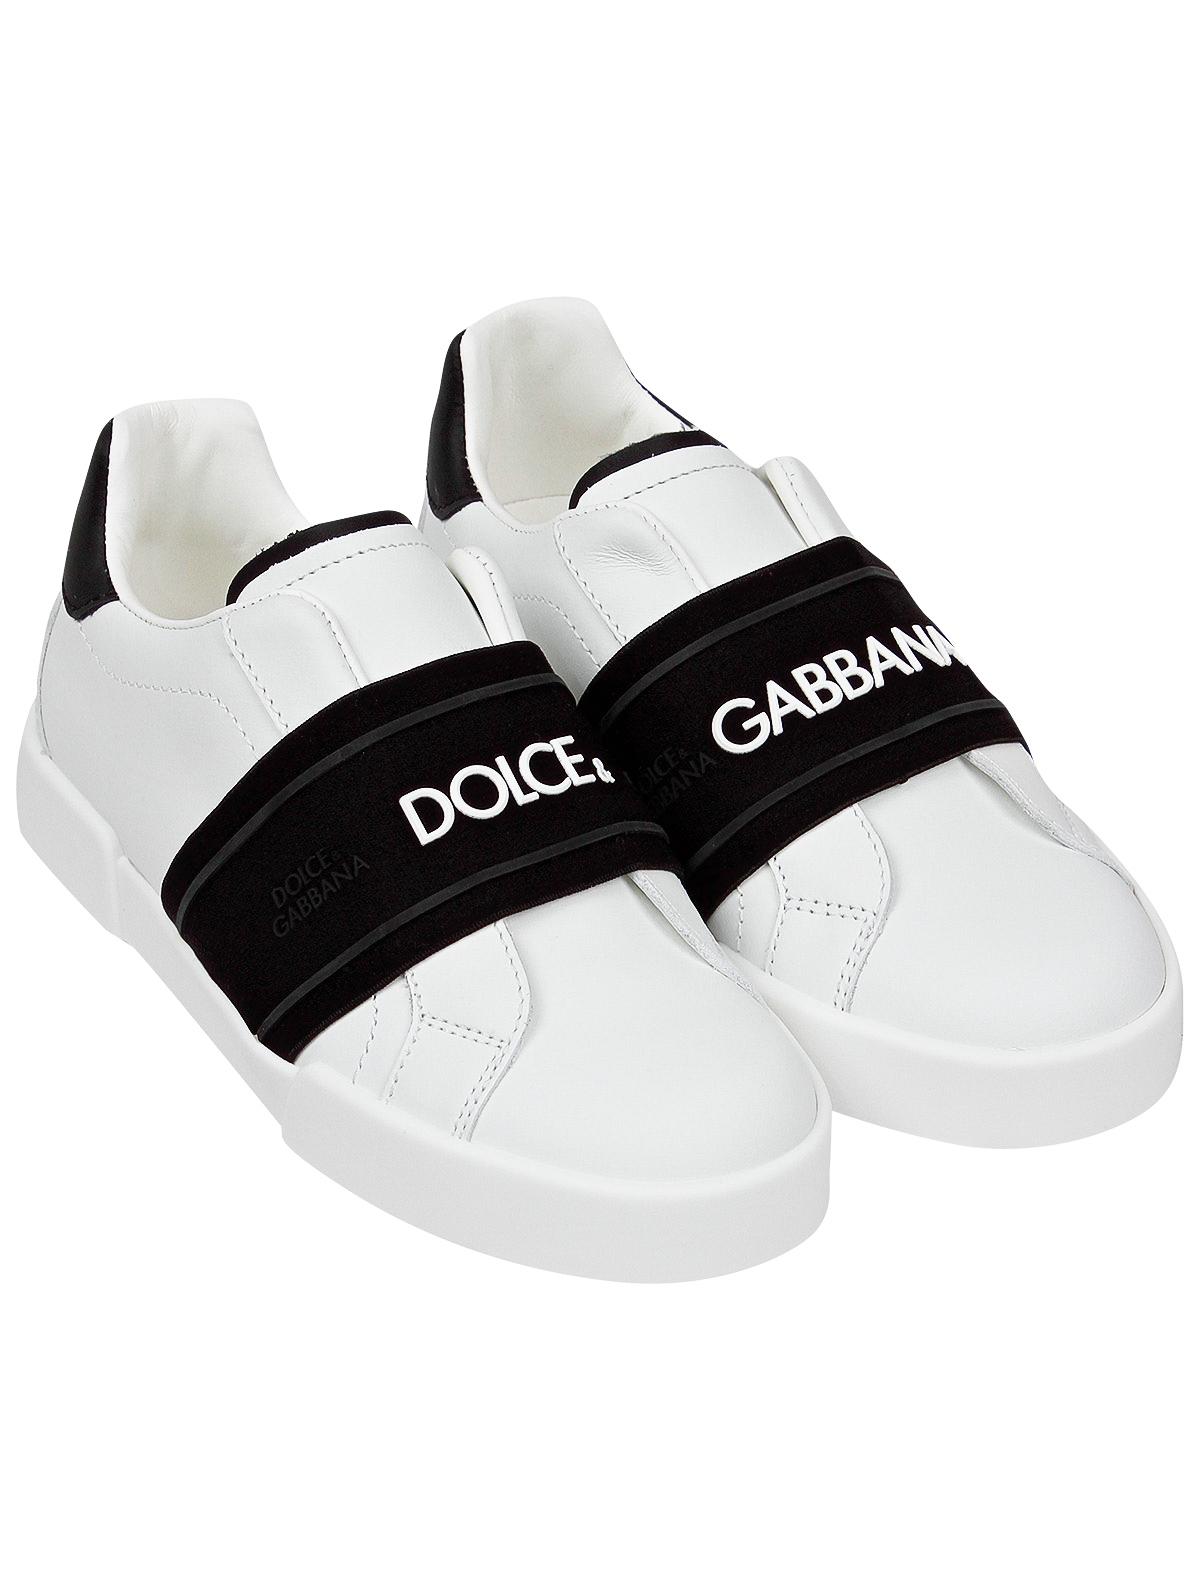 Купить 2175420, Кеды Dolce & Gabbana, белый, 2094529070284